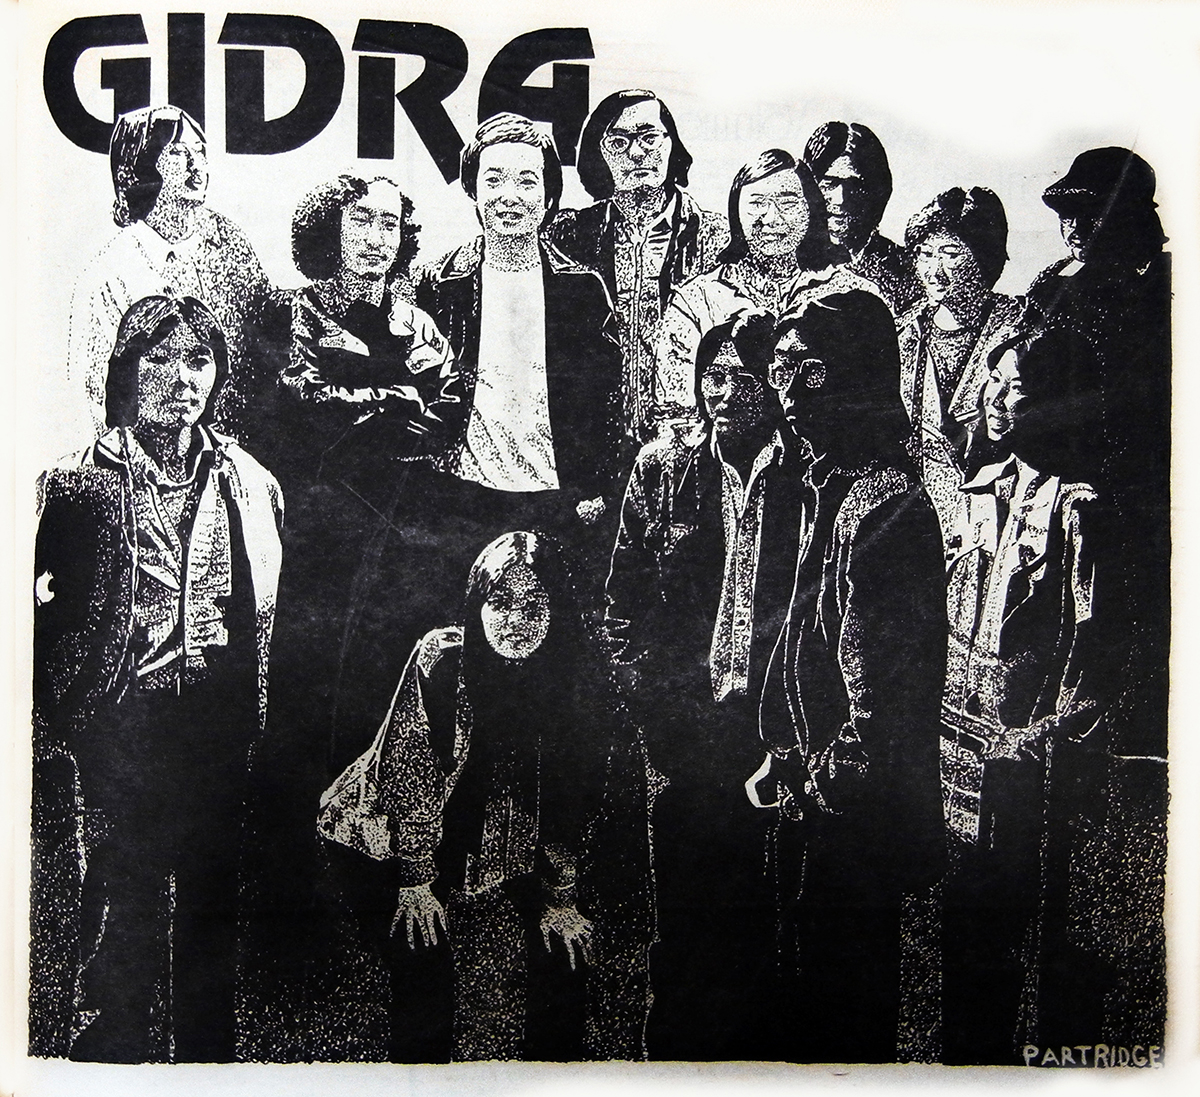 dailybruin.com: Alumni, community members discuss Gidra's legacy, importance to Asian Americans